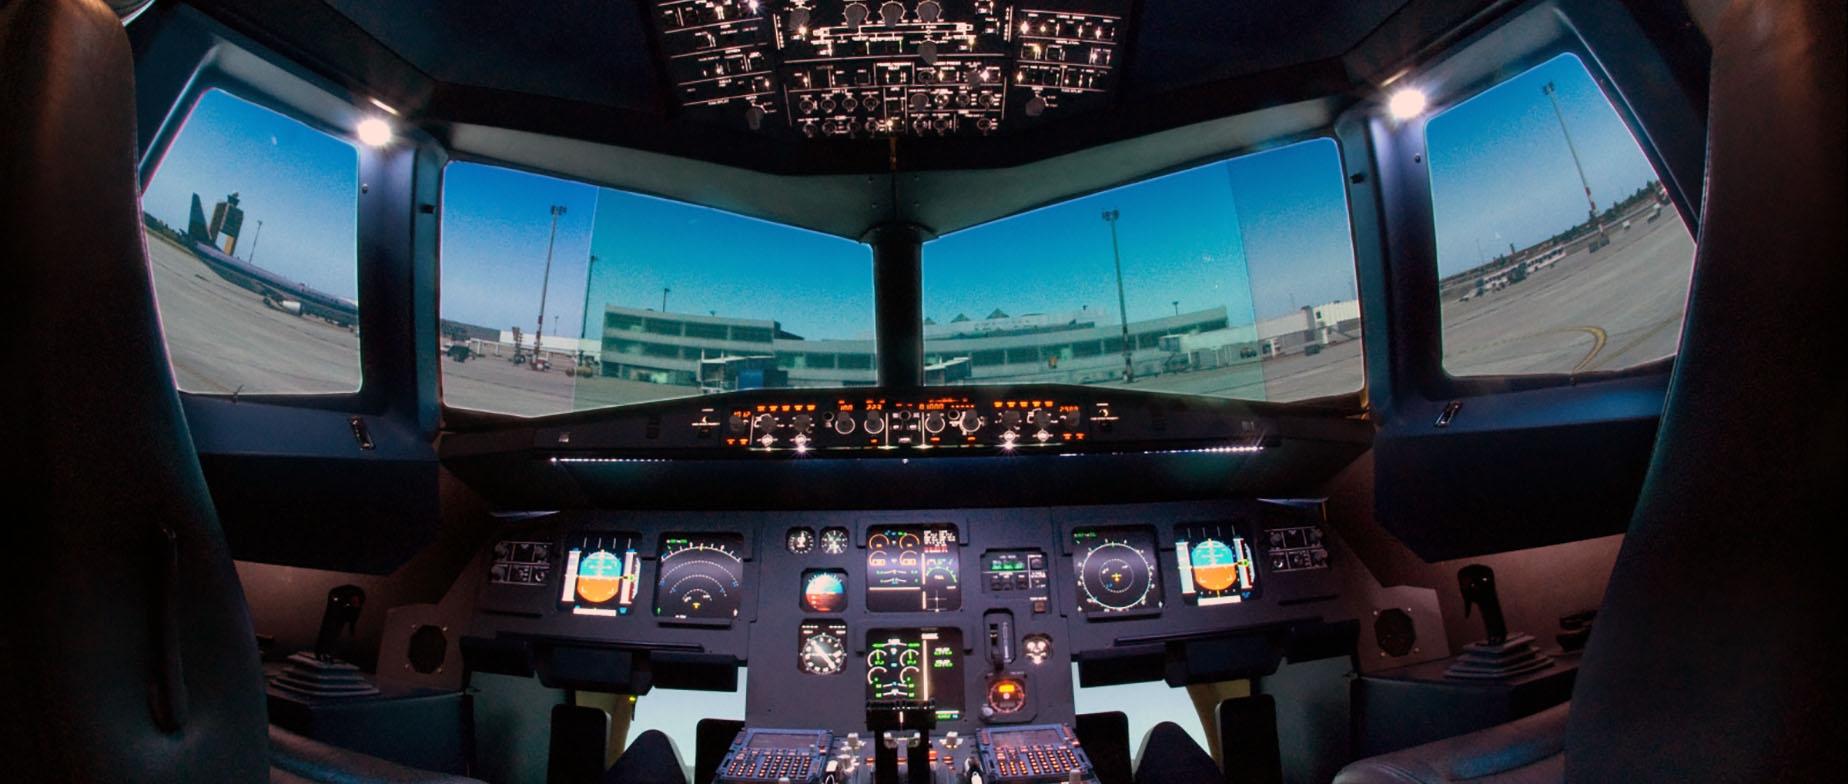 Airbus repülőgép szimulátor